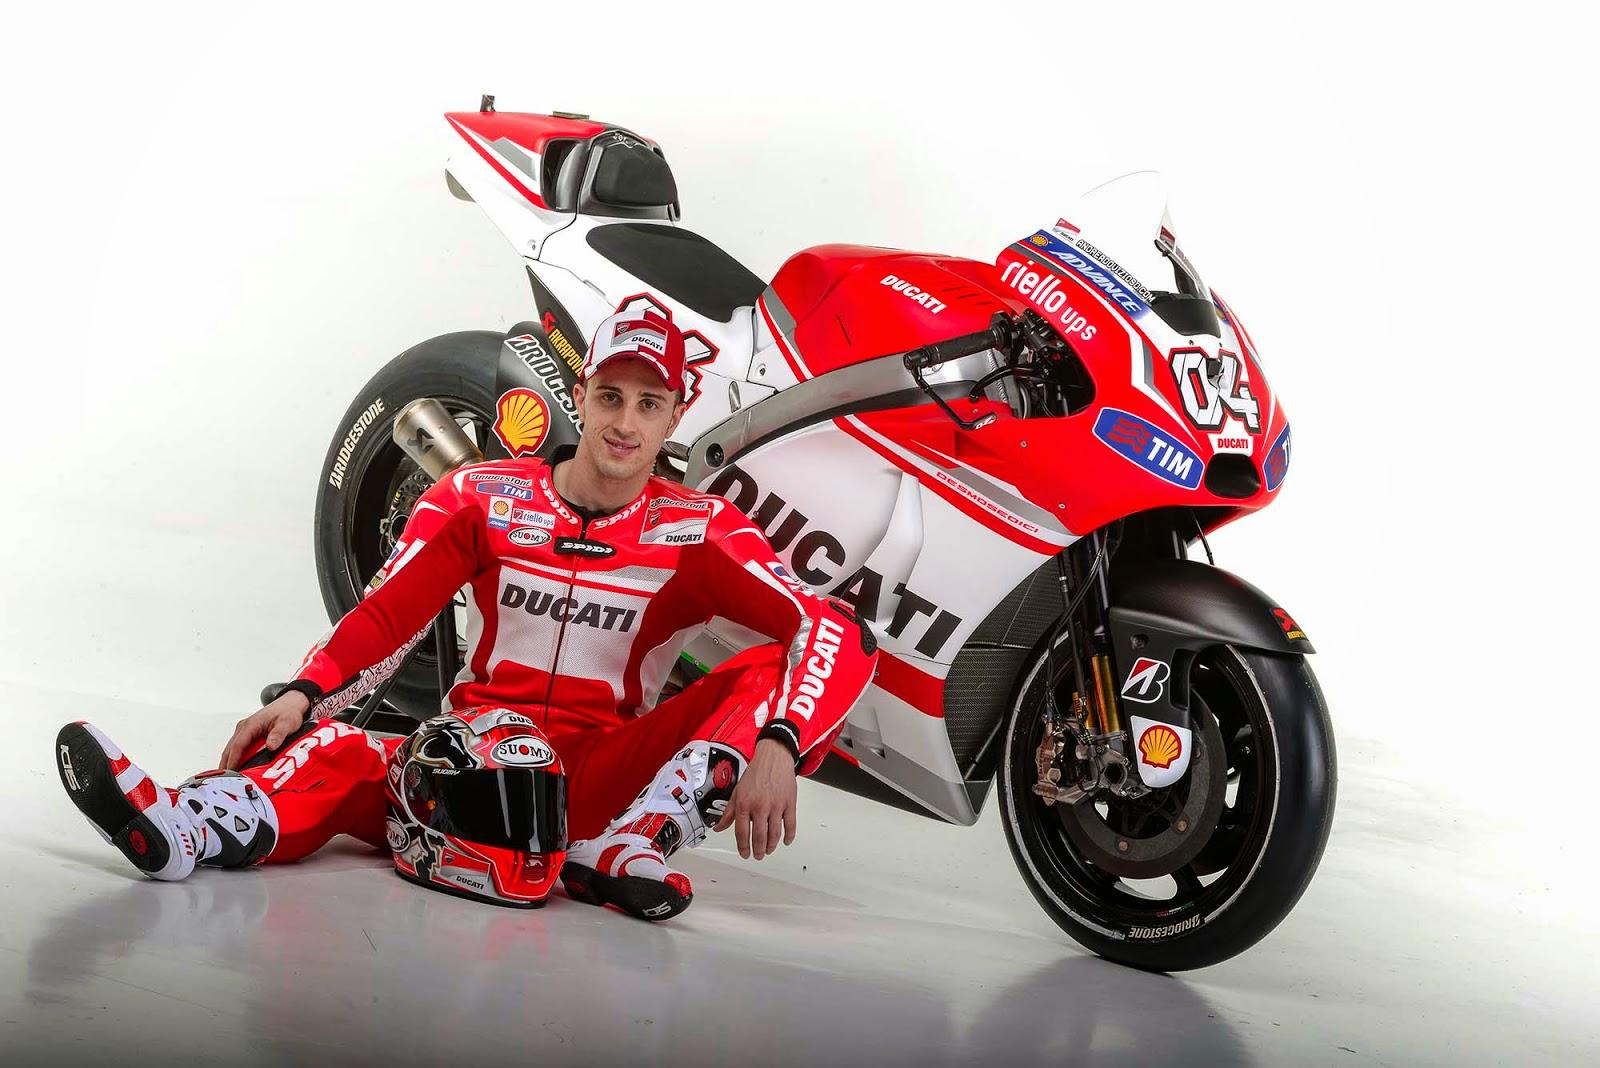 Kesialan Andrea Dovizioso di MotoGP 2016 - Berita MotoGP